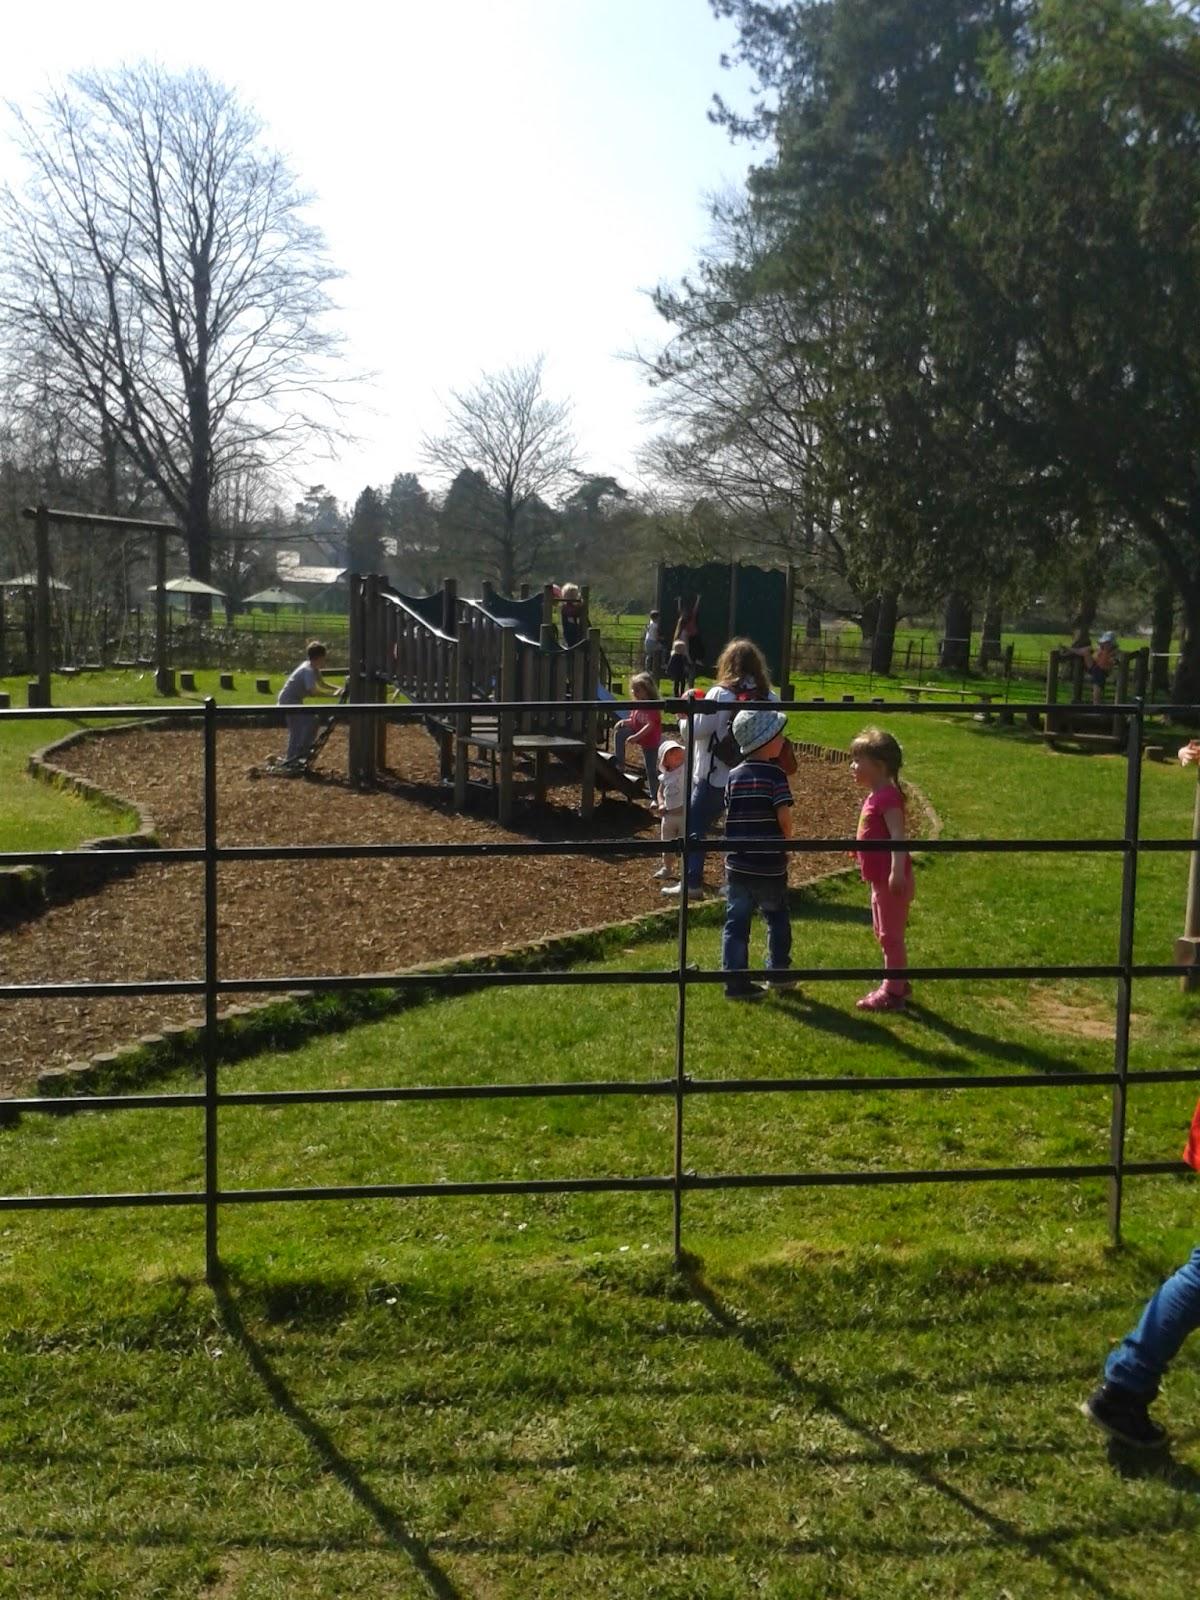 Play area, Dyffryn Gardens